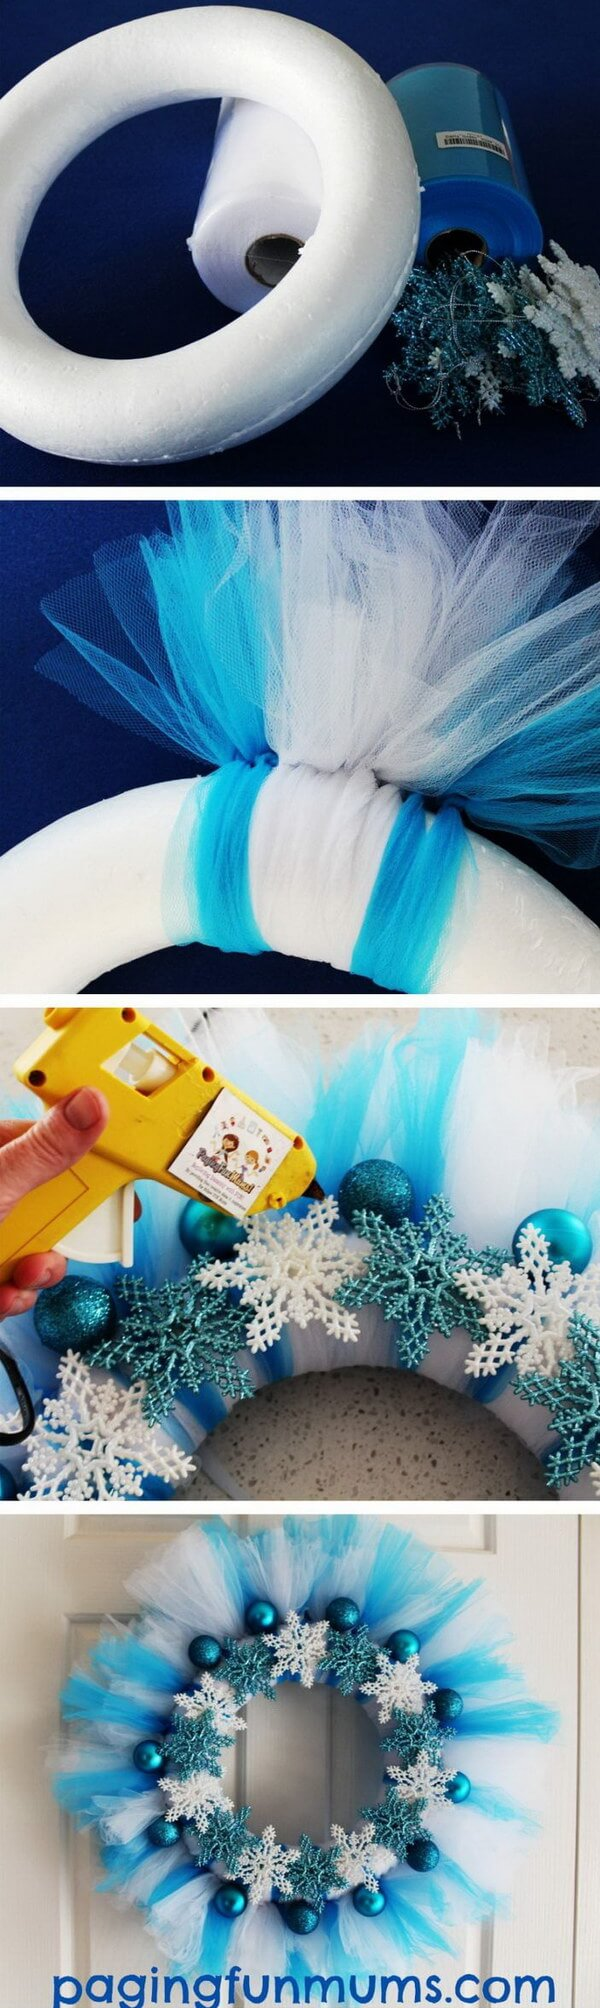 Frozen Inspired Blue Snowflake Design